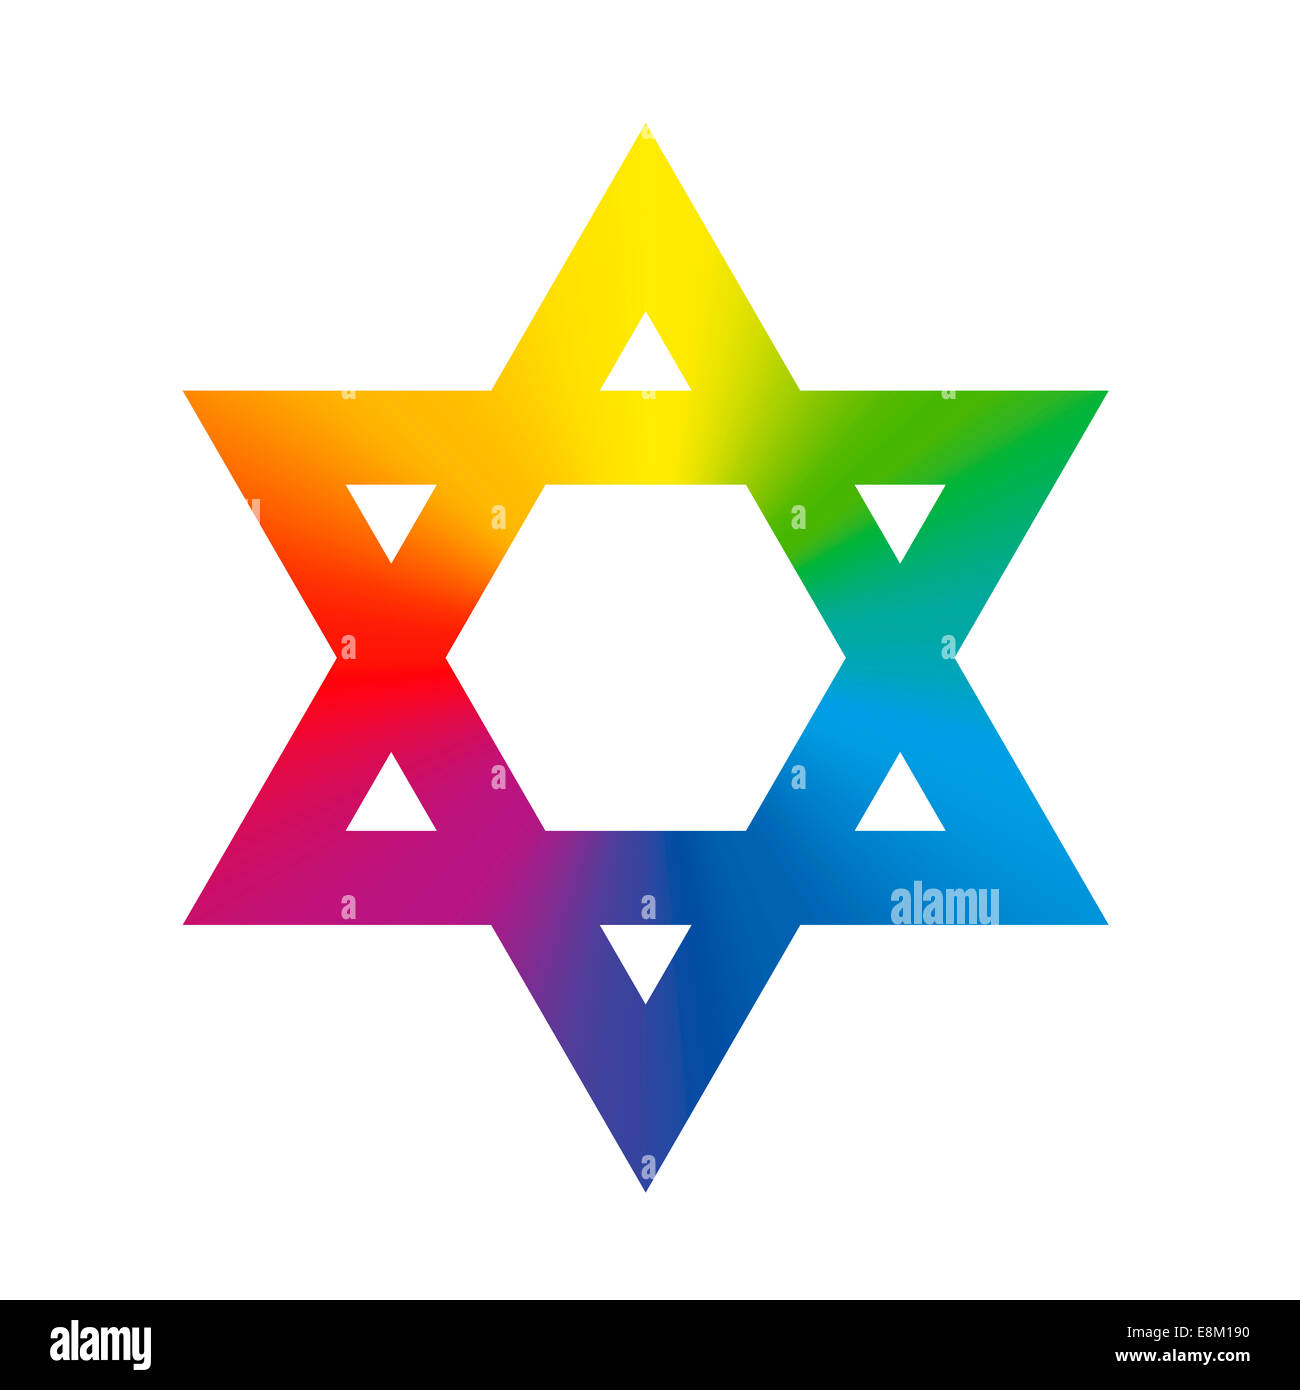 Star of David symbol with circular rainbow gradient coloring. - Stock Image